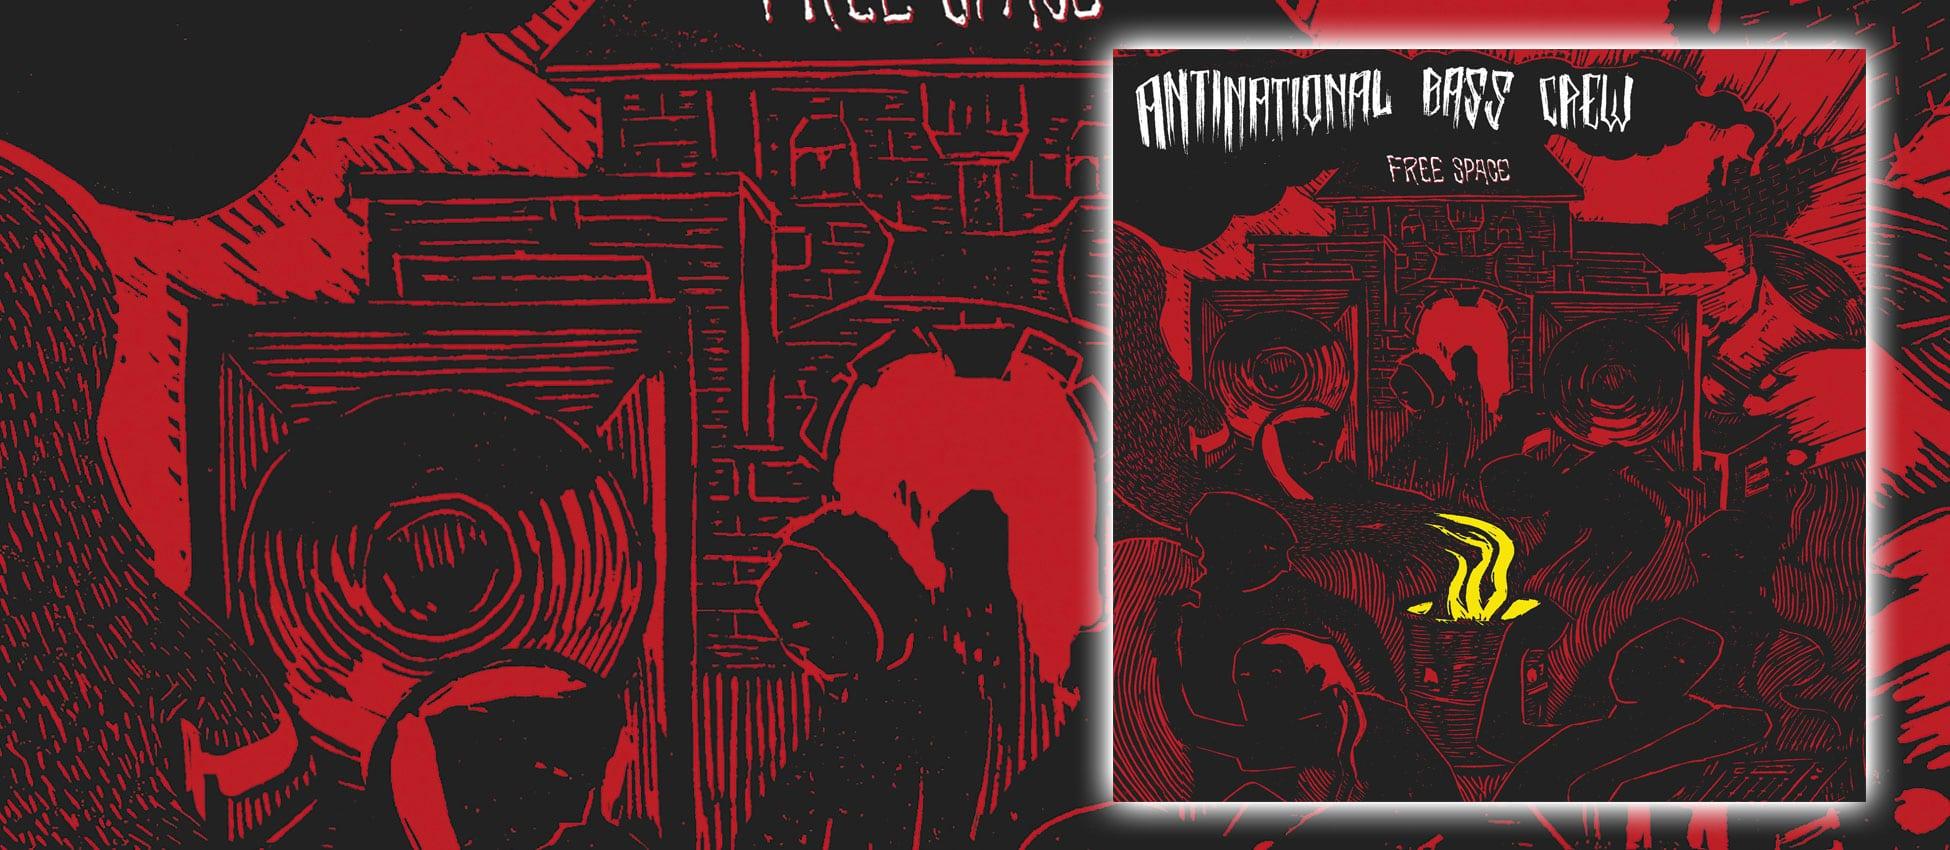 [FFM070] Antinational Bass Crew – Free Space